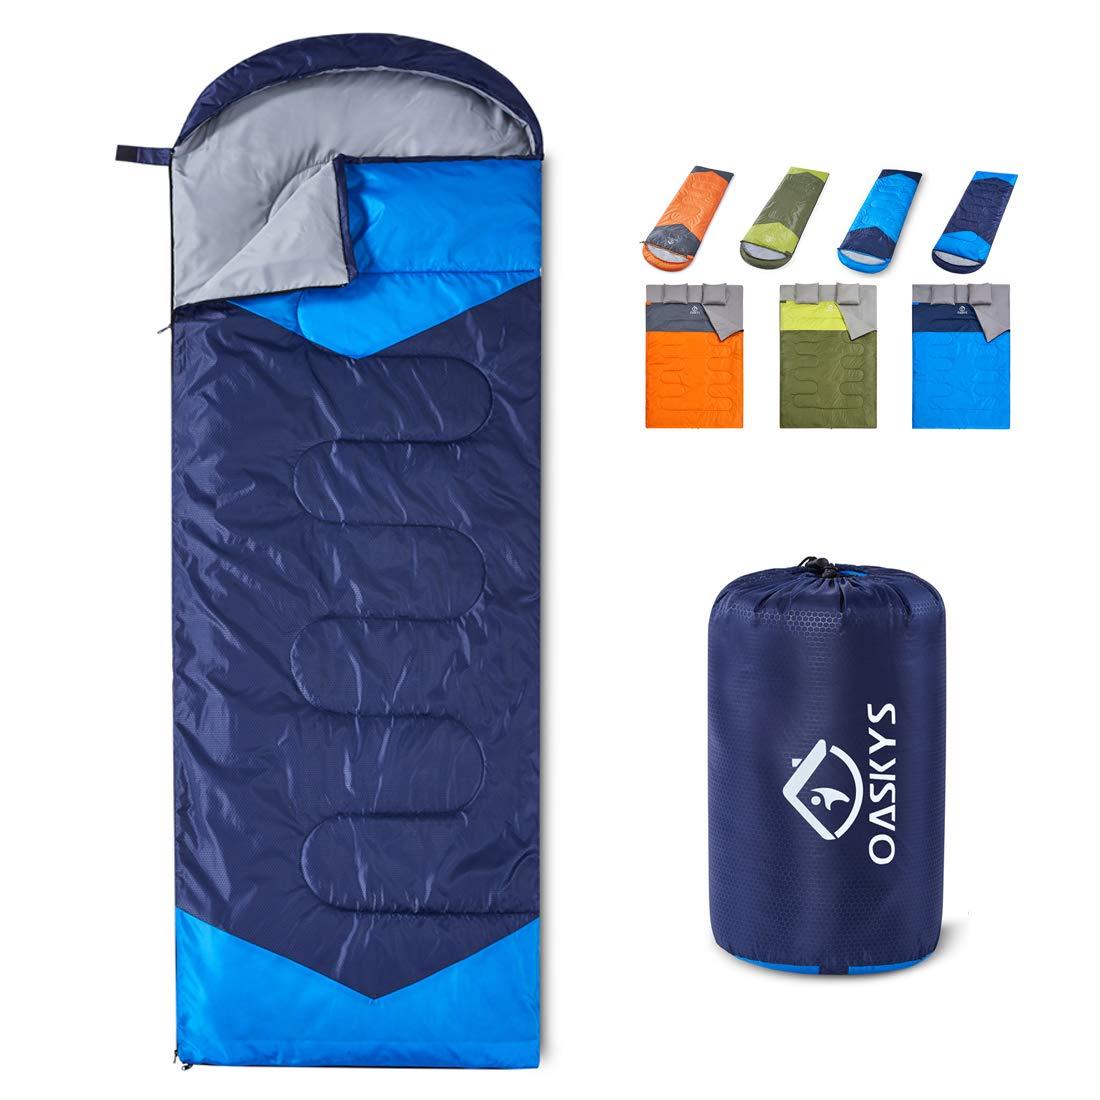 oaskys Camping Sleeping Bag Lightweight